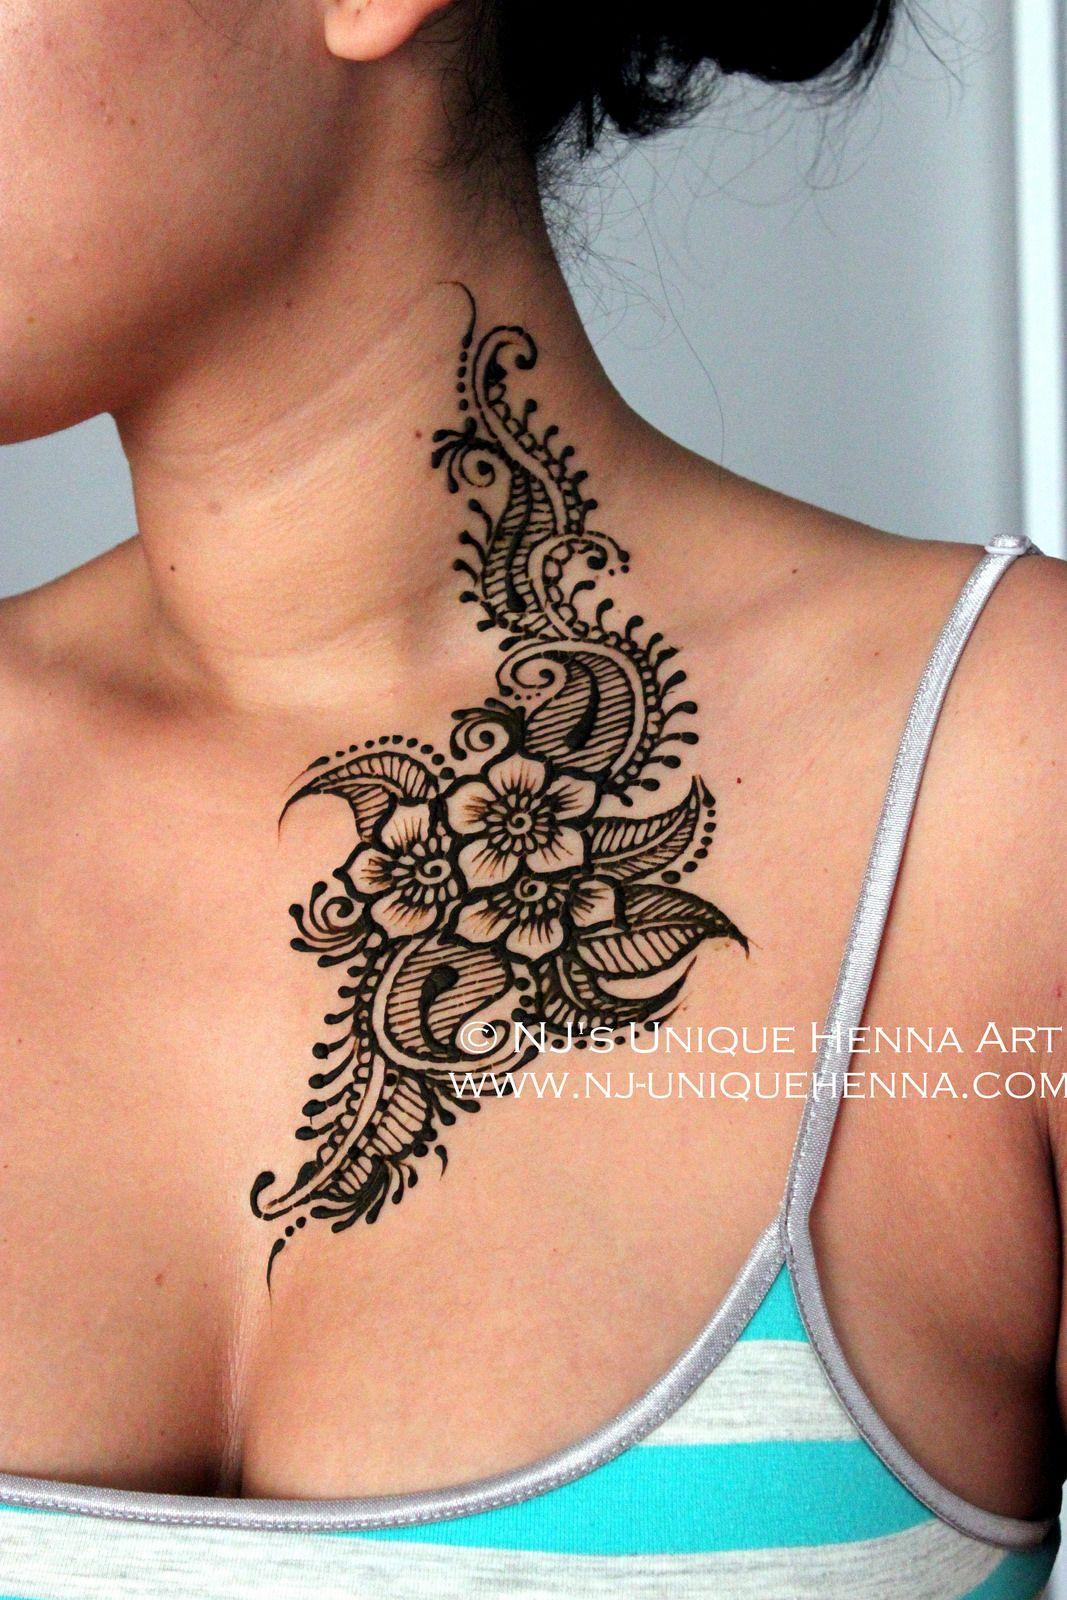 Kenia S Henna Body Art From Neck To Chest 2013 C Nj S Unique Henna